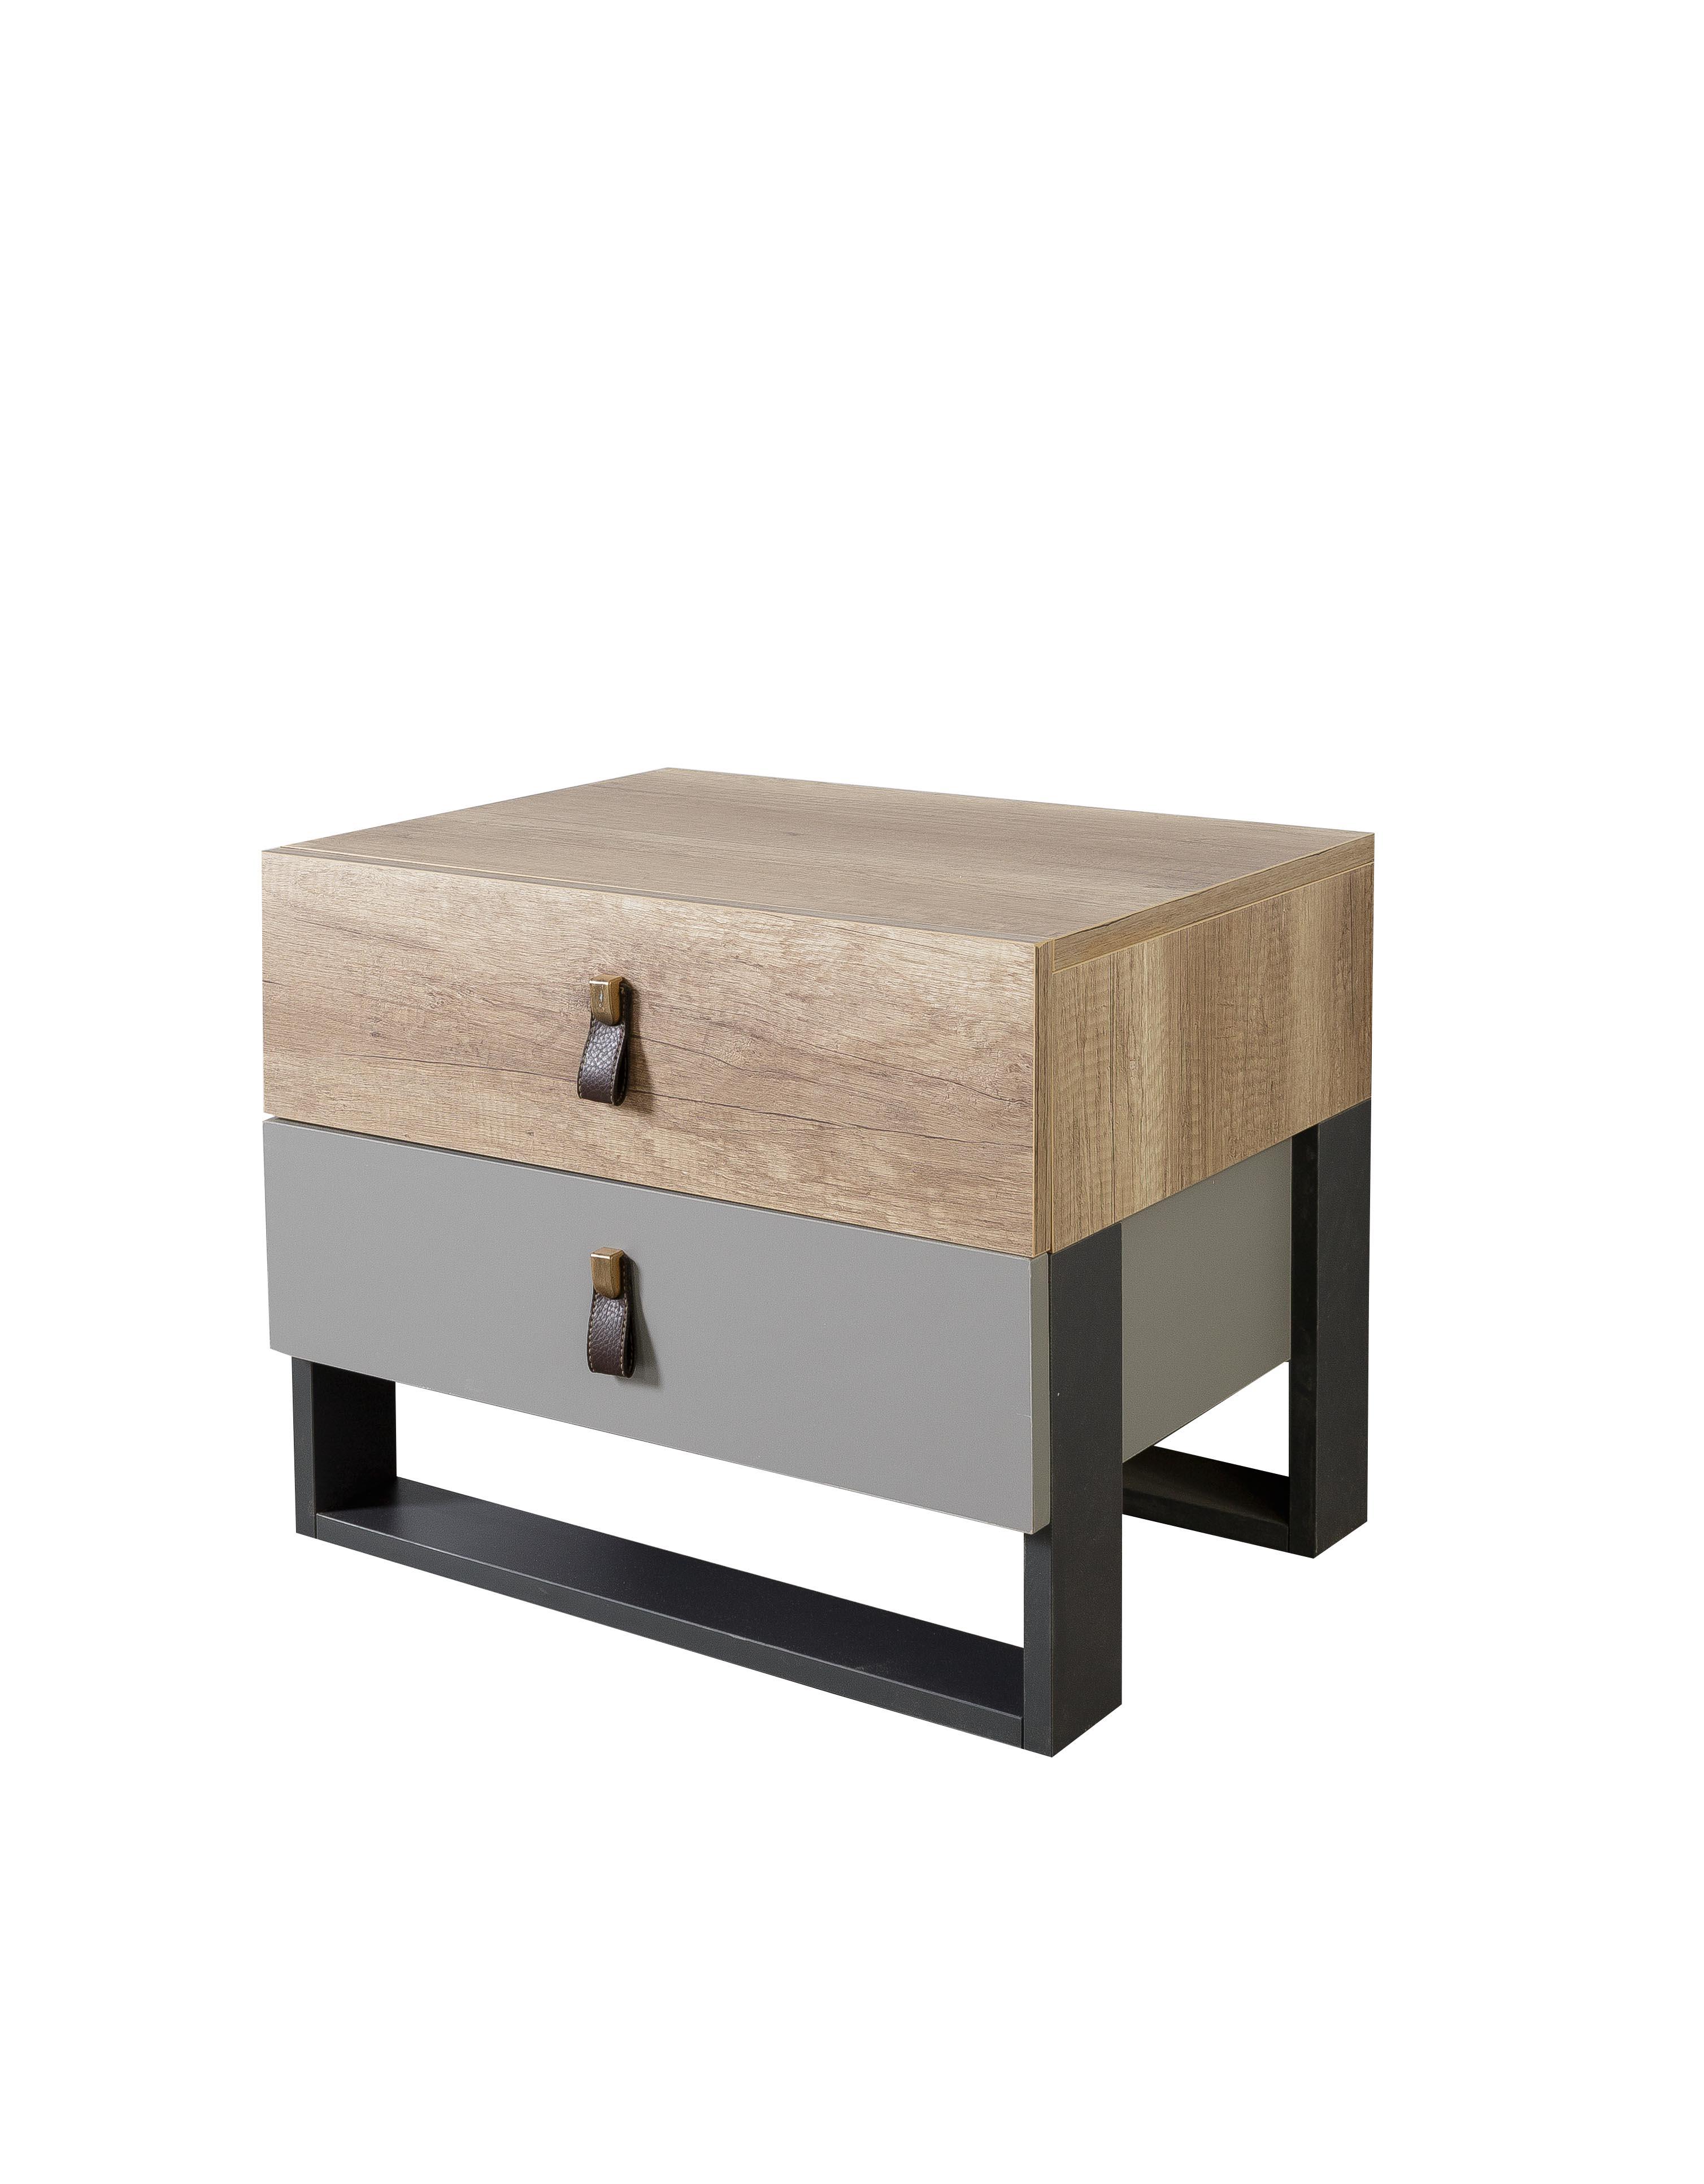 Titi Design Nachtkommode Corner mit Schubkästen